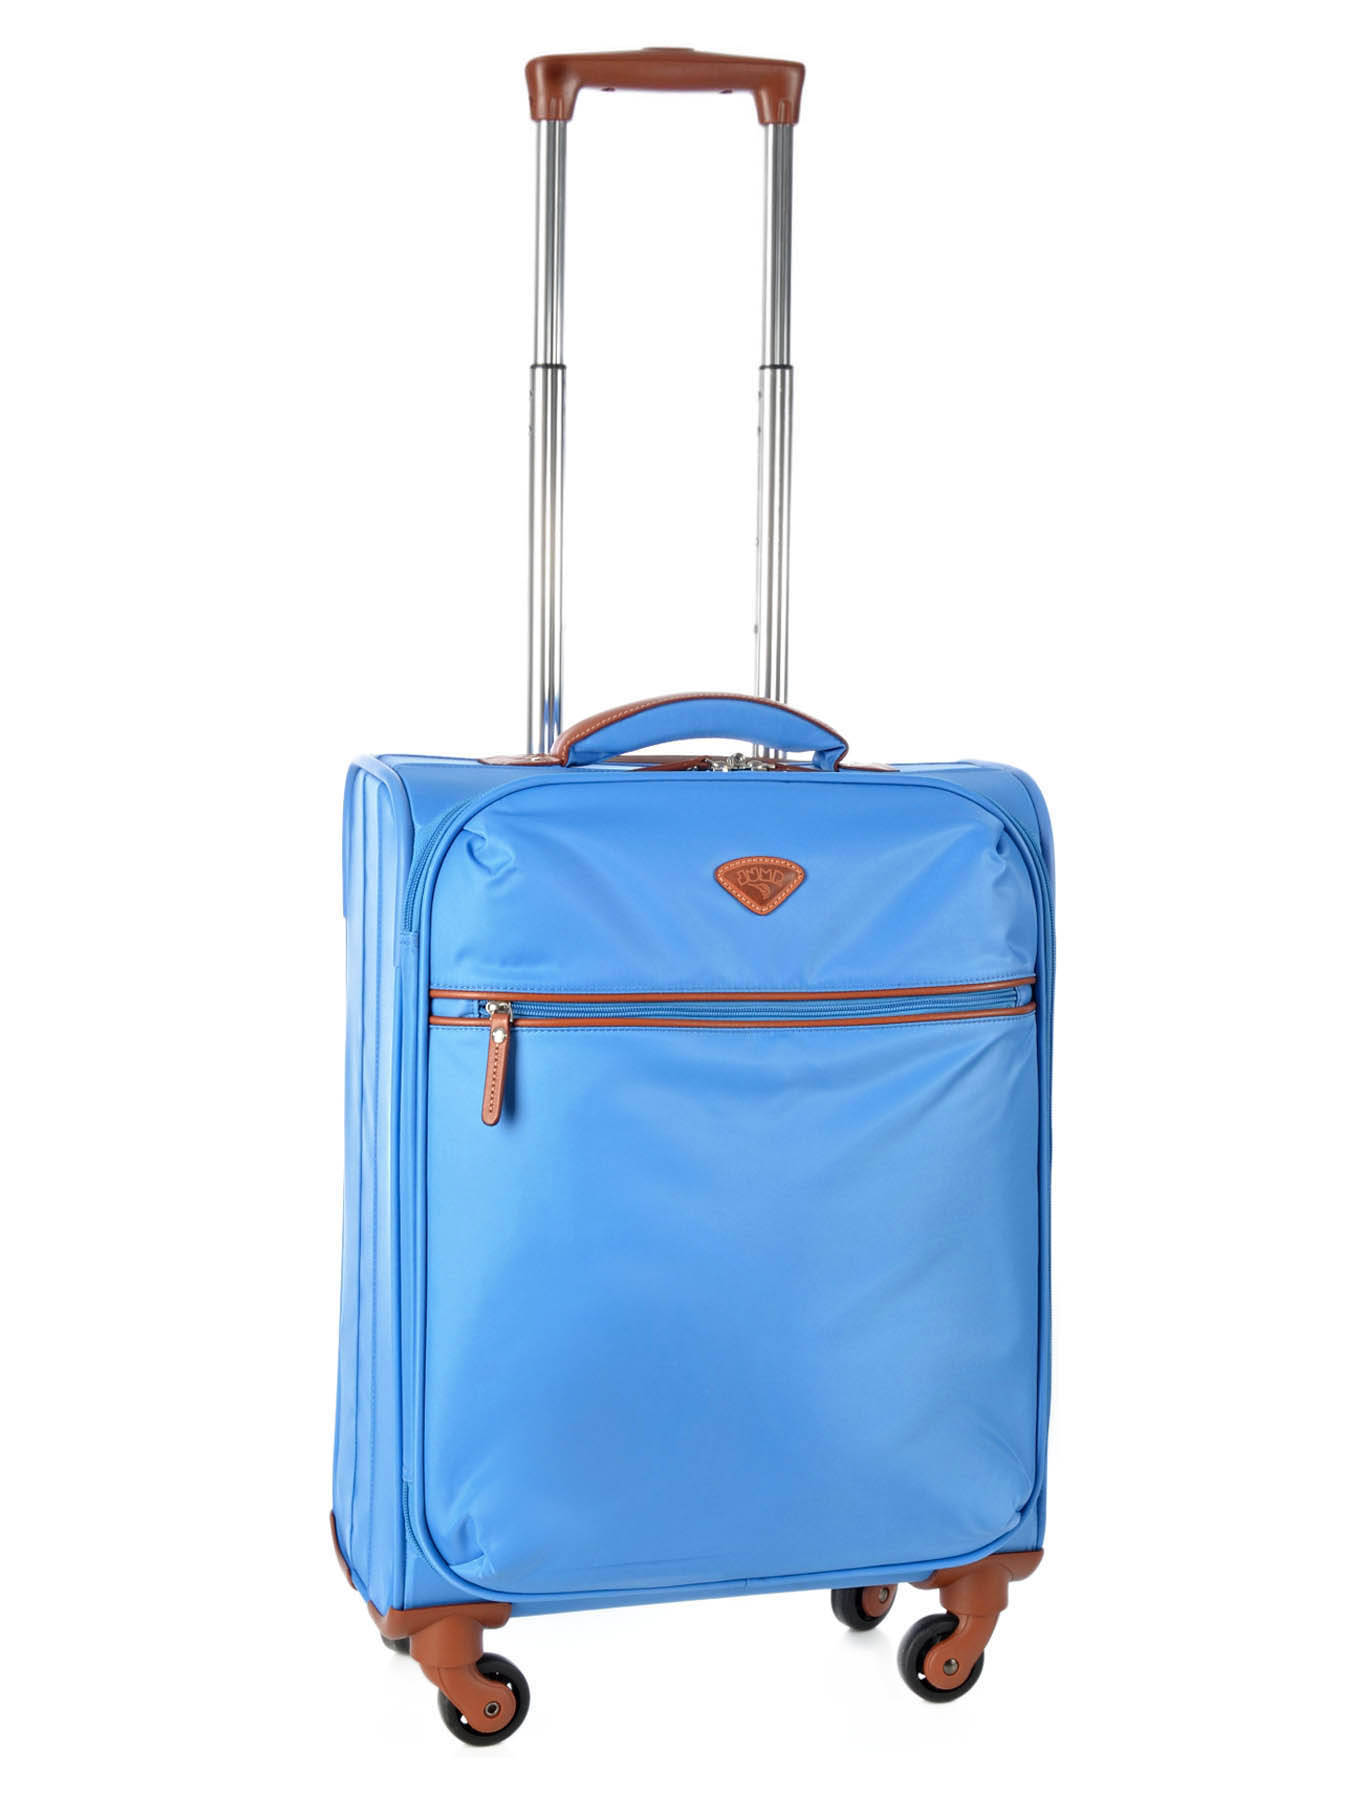 valise cabine jump nice nice en vente au meilleur prix. Black Bedroom Furniture Sets. Home Design Ideas